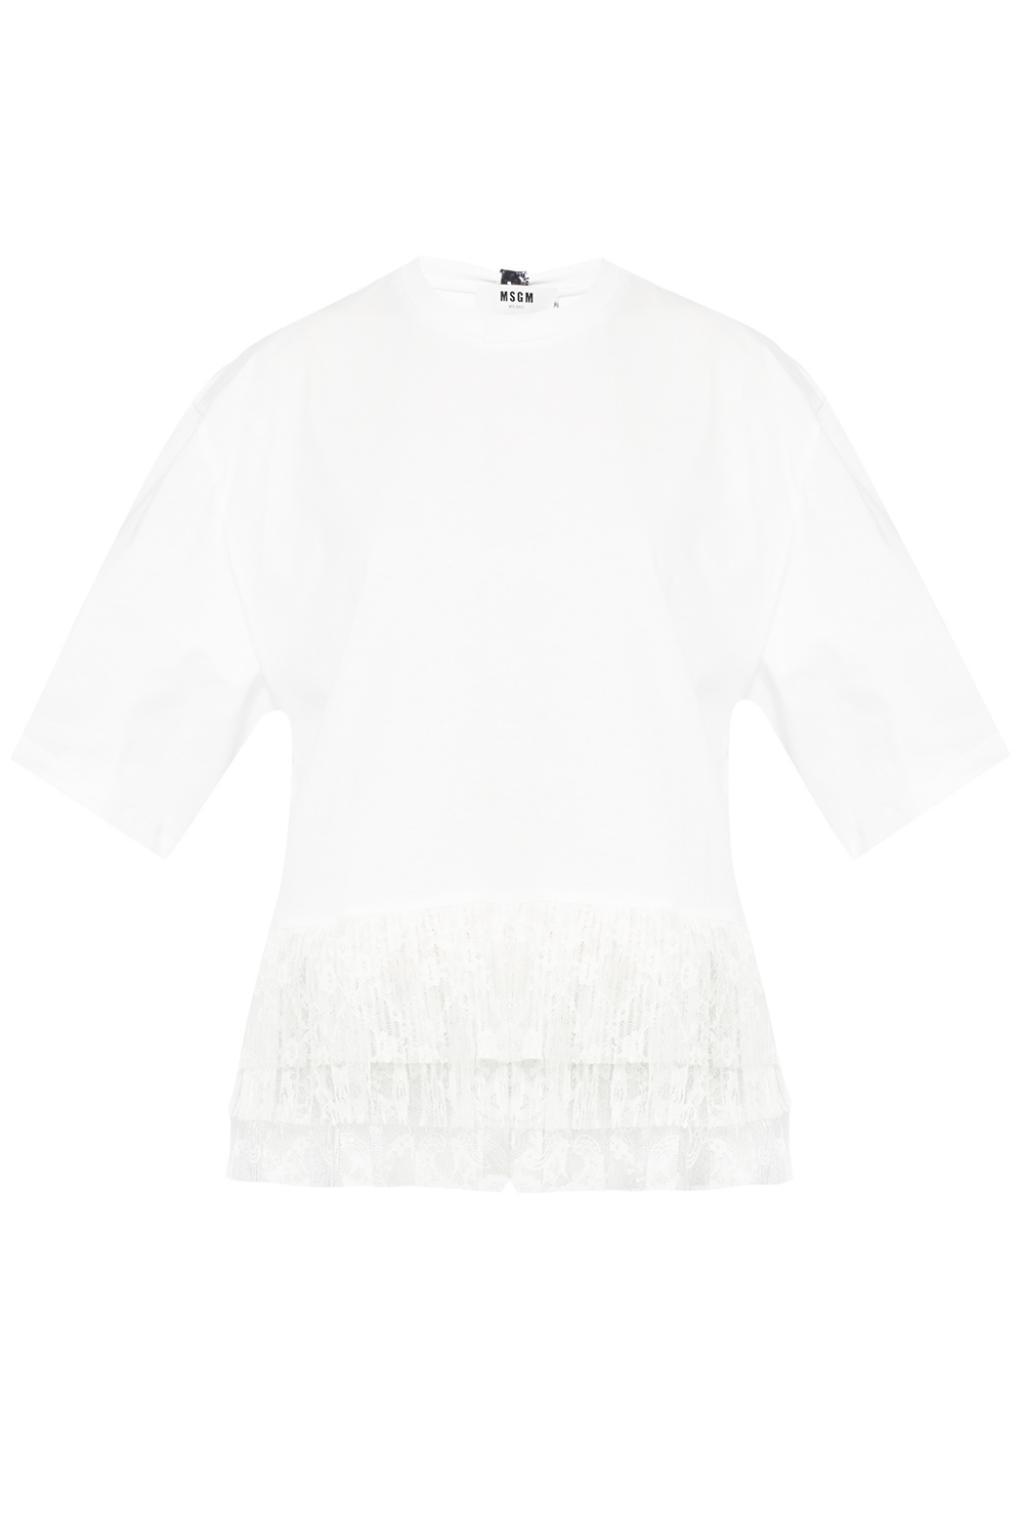 lace trim T-shirt - White Msgm Get To Buy Online Cheap Sale 2018 New Sast Cheap Online Cheap Sale High Quality pDCDL